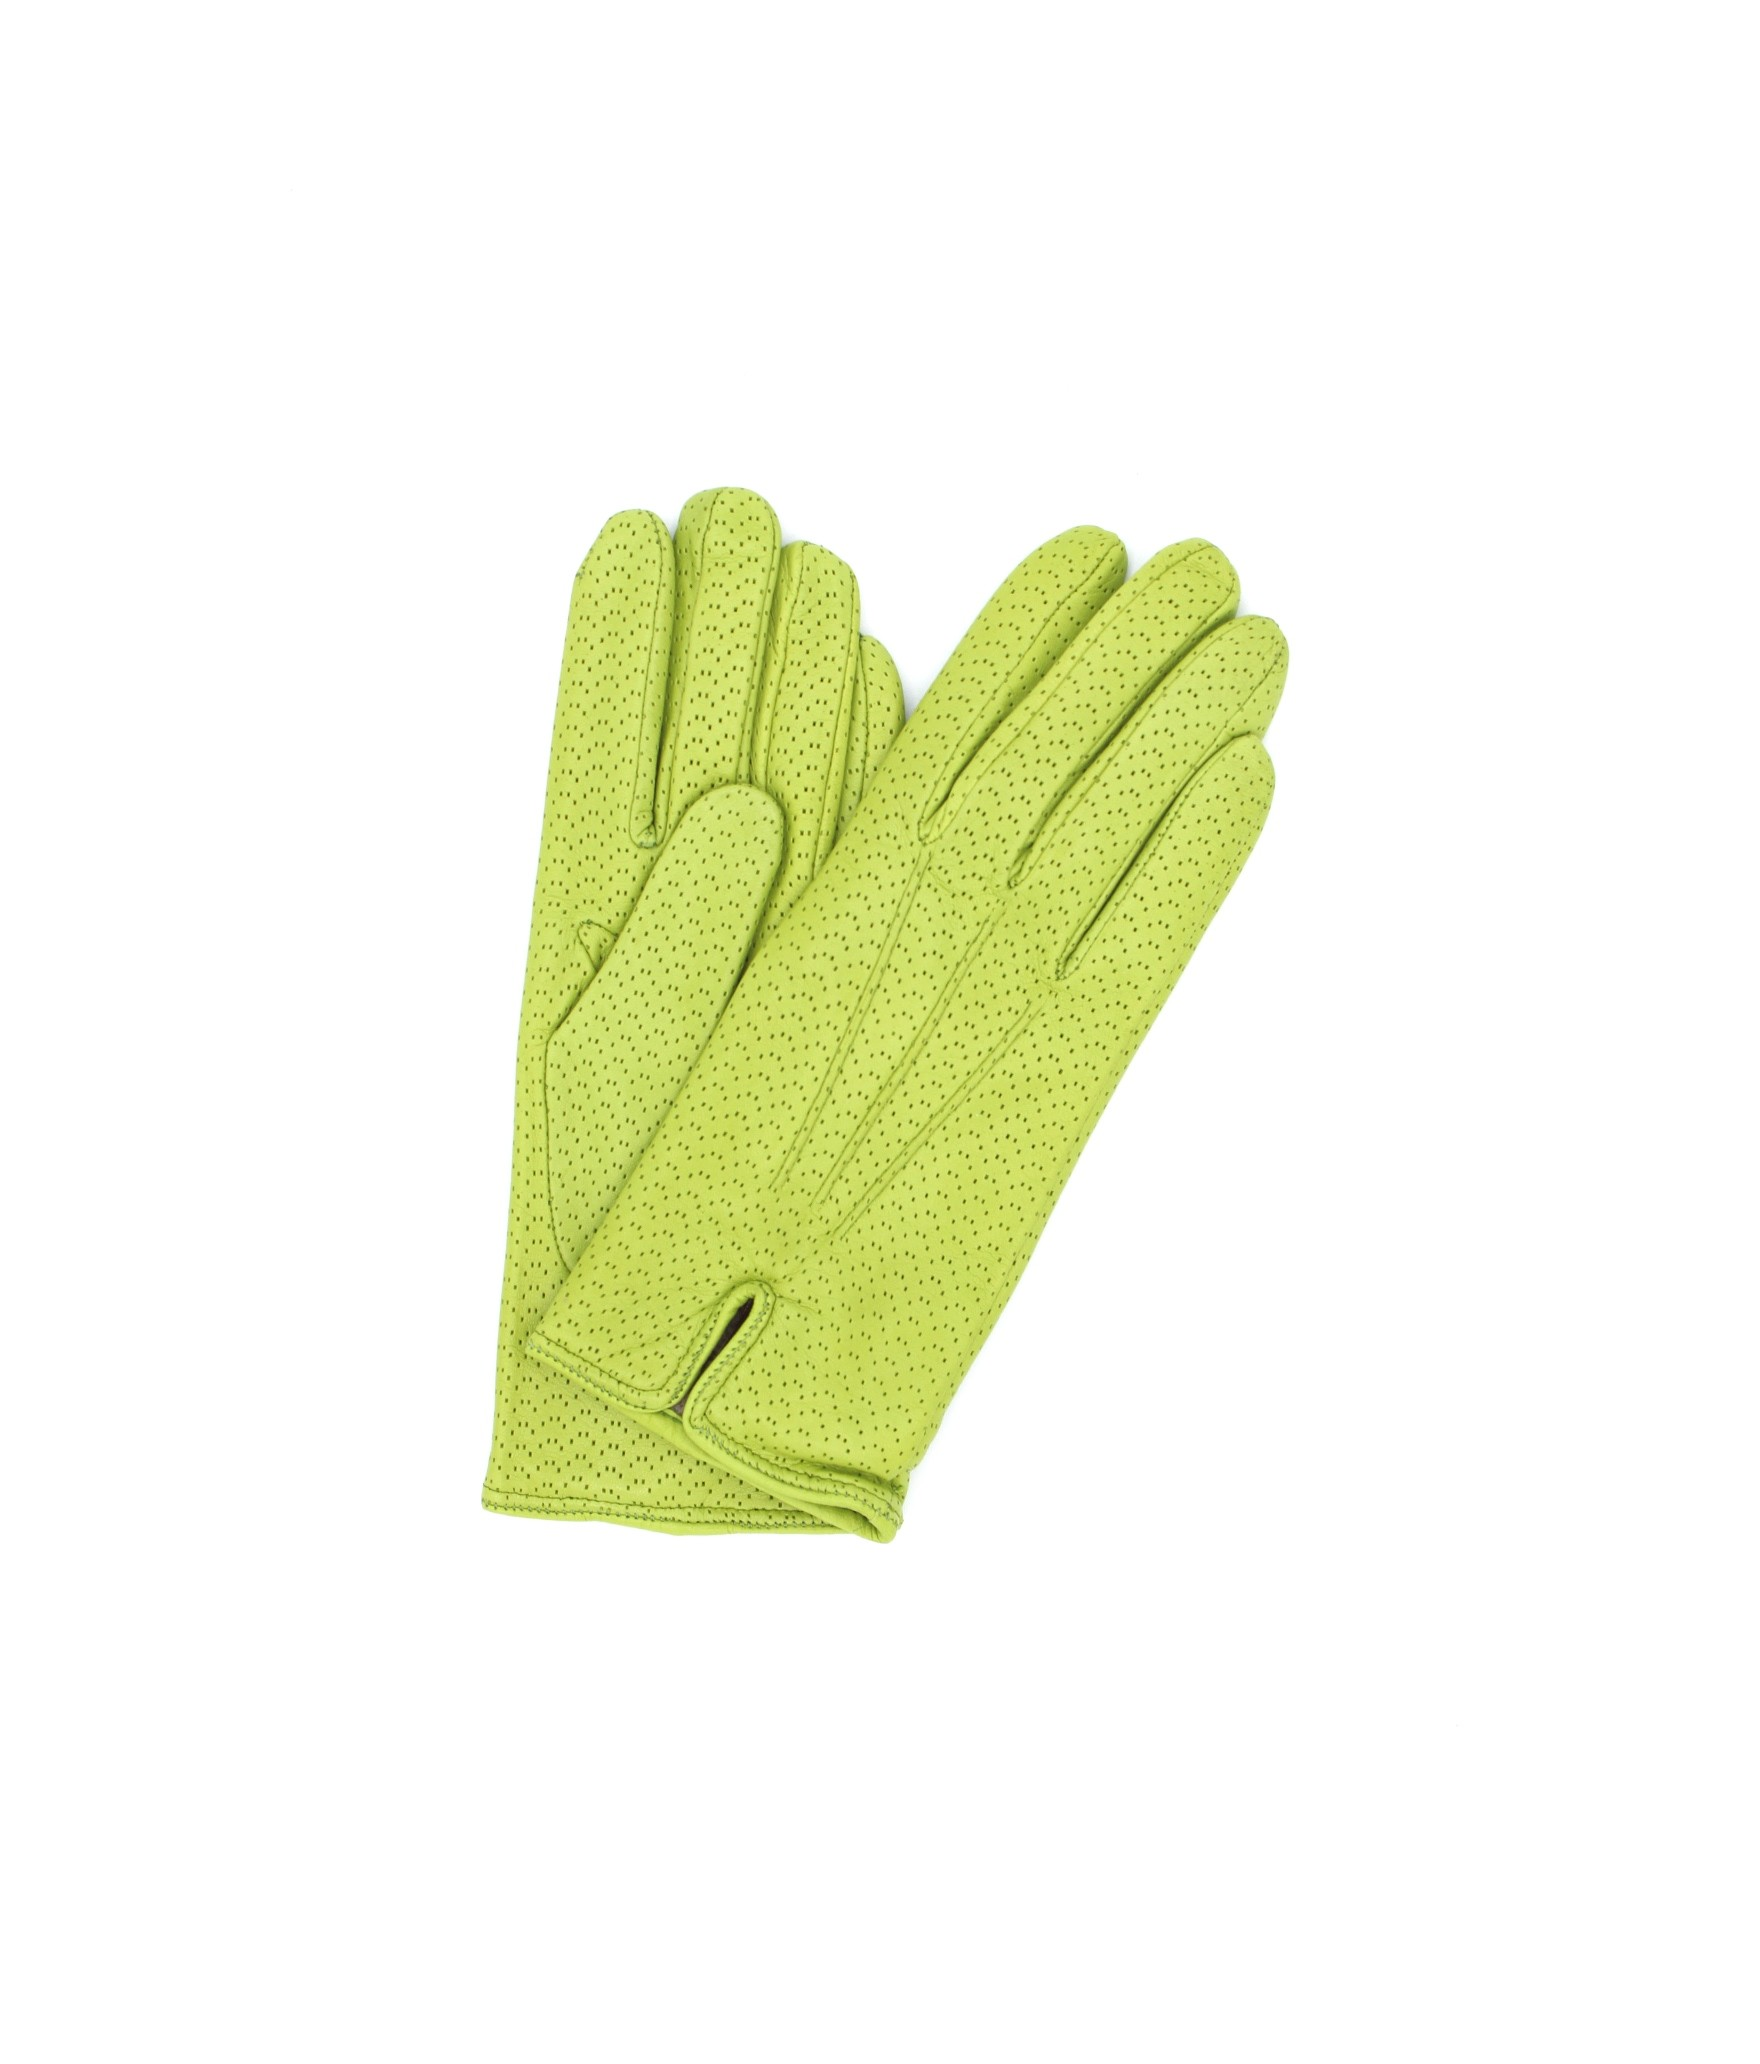 Nappa leather gloves cashmere lined Pistachio Sermoneta Gloves